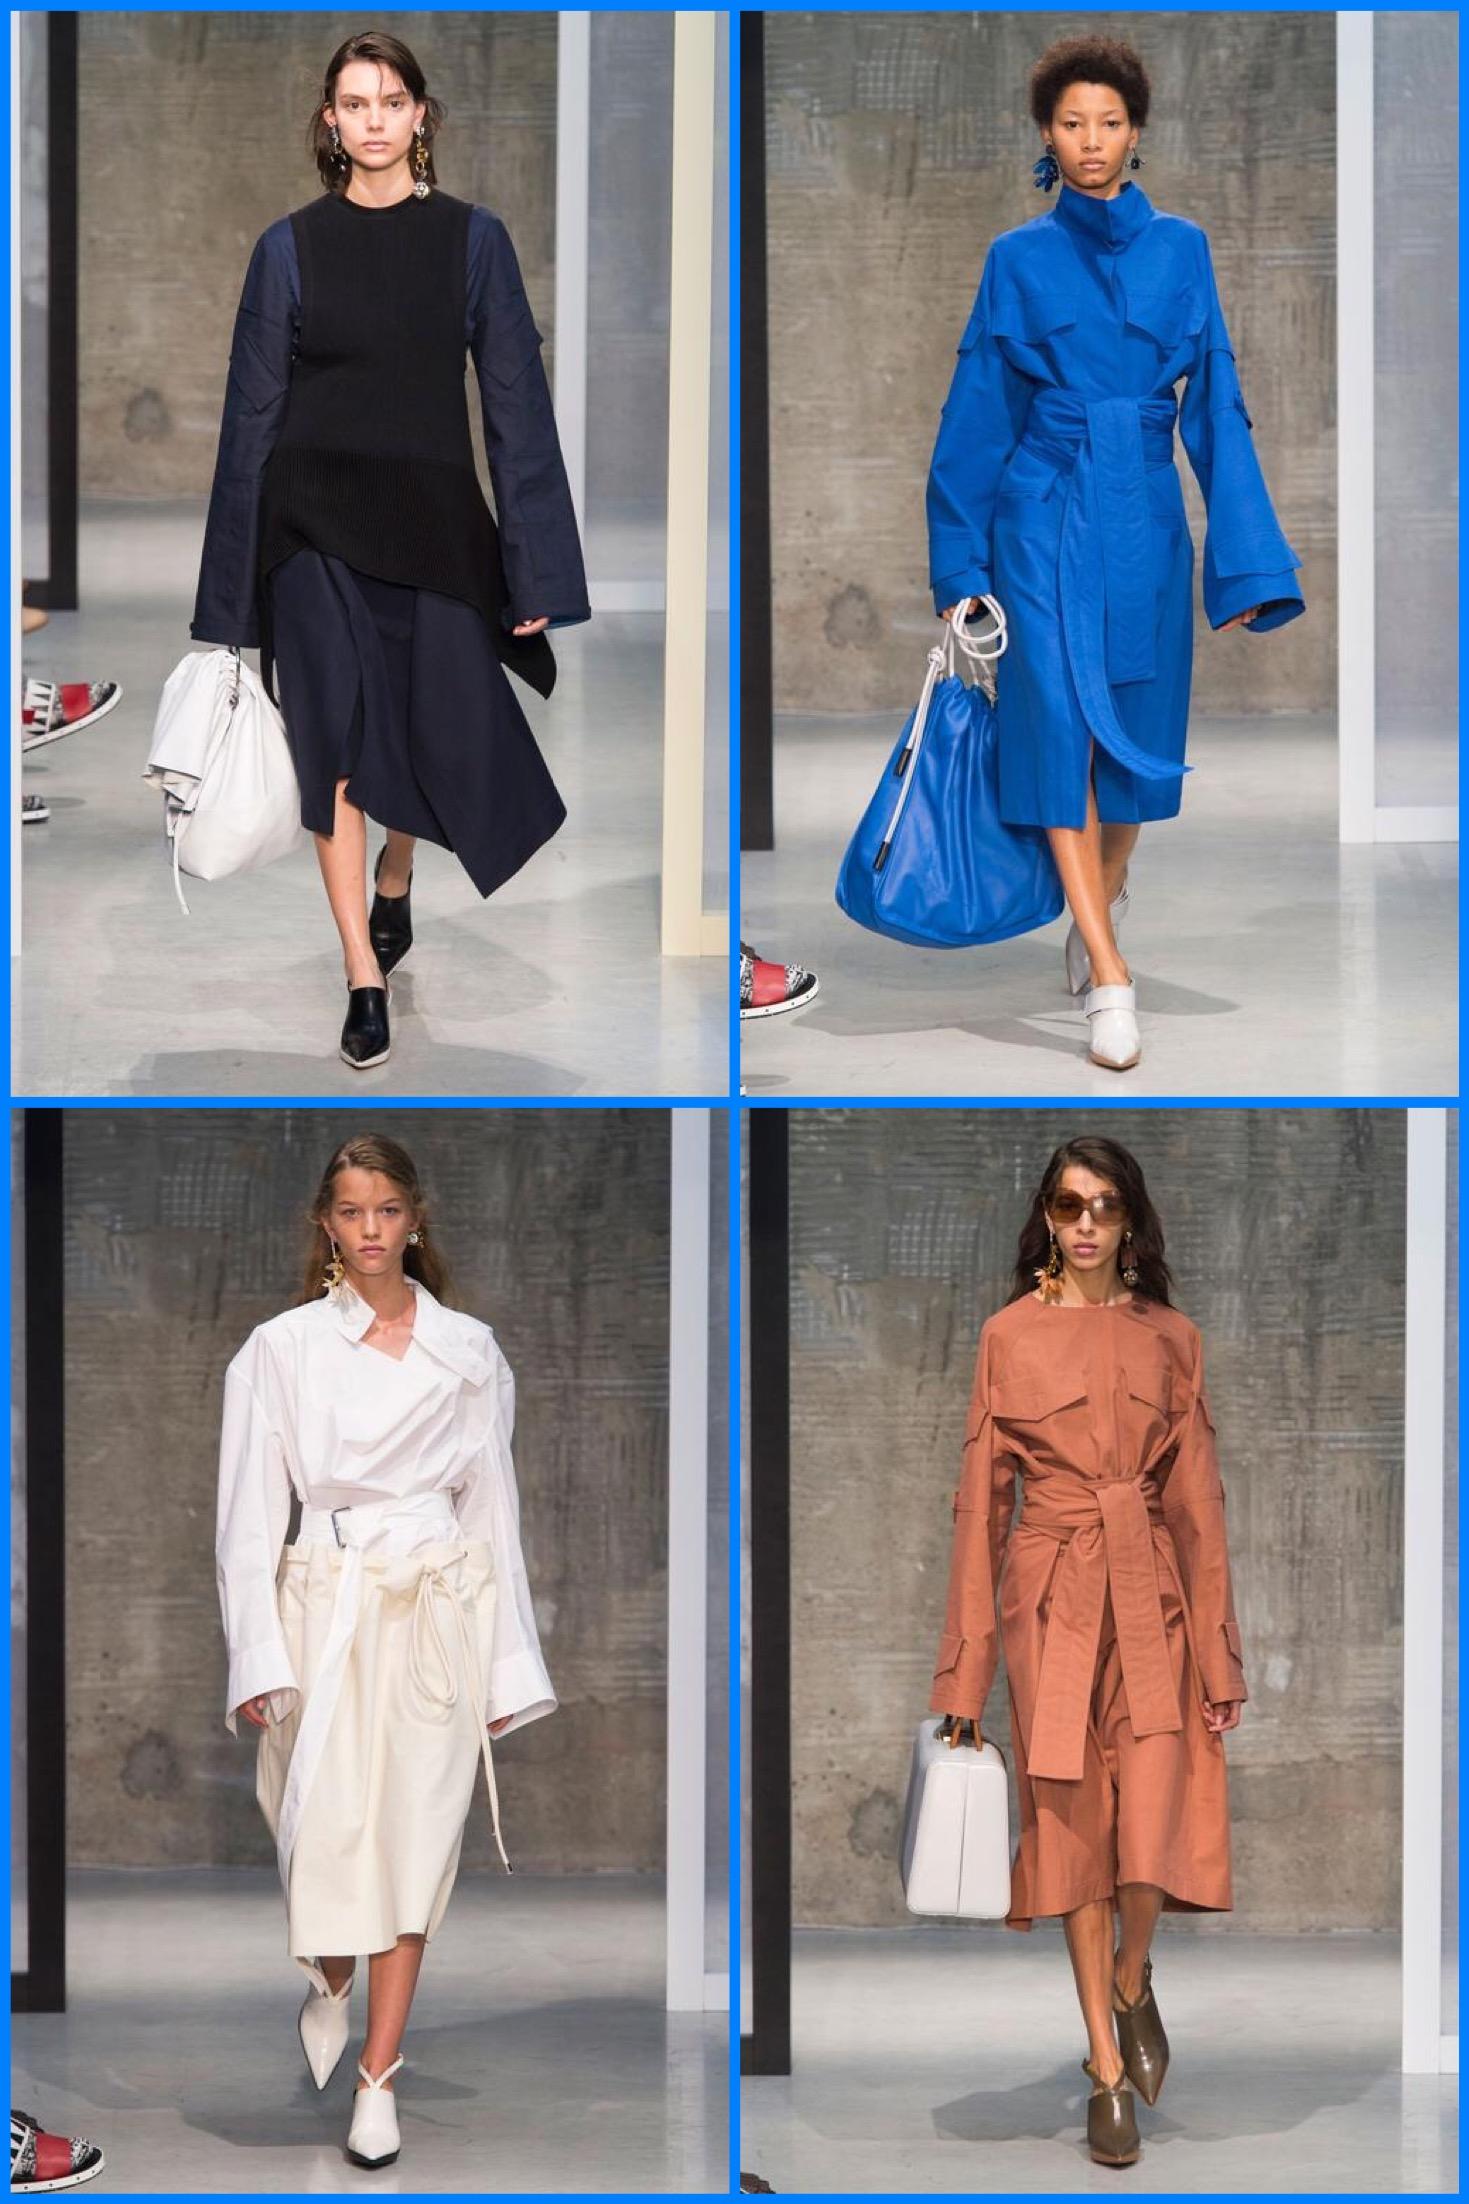 milano-fashion-week-pret-a-porter-spring-summer-2017-style-marni